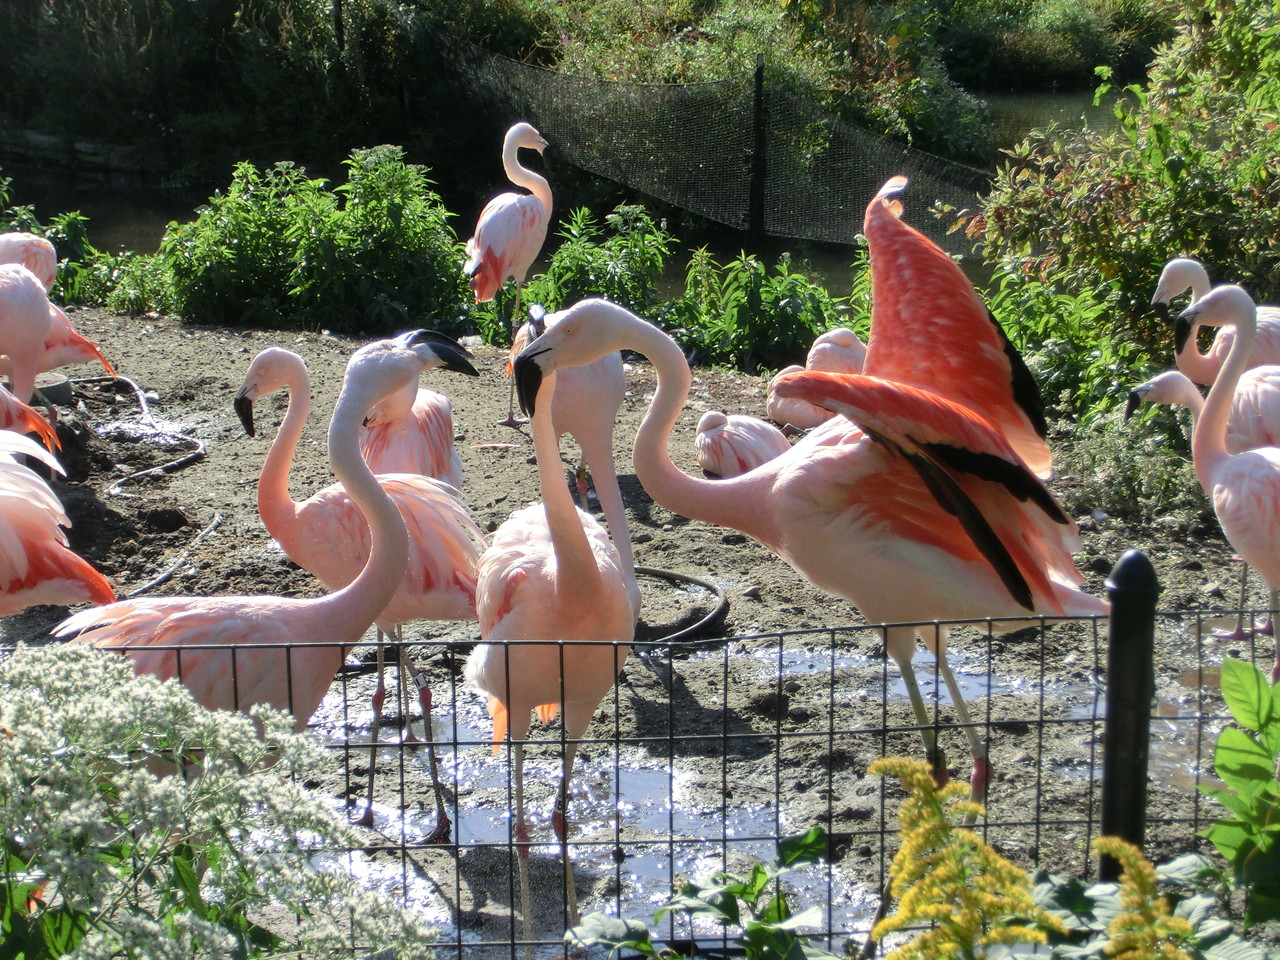 Flamingos - Lincoln Park Zoo - Chicago